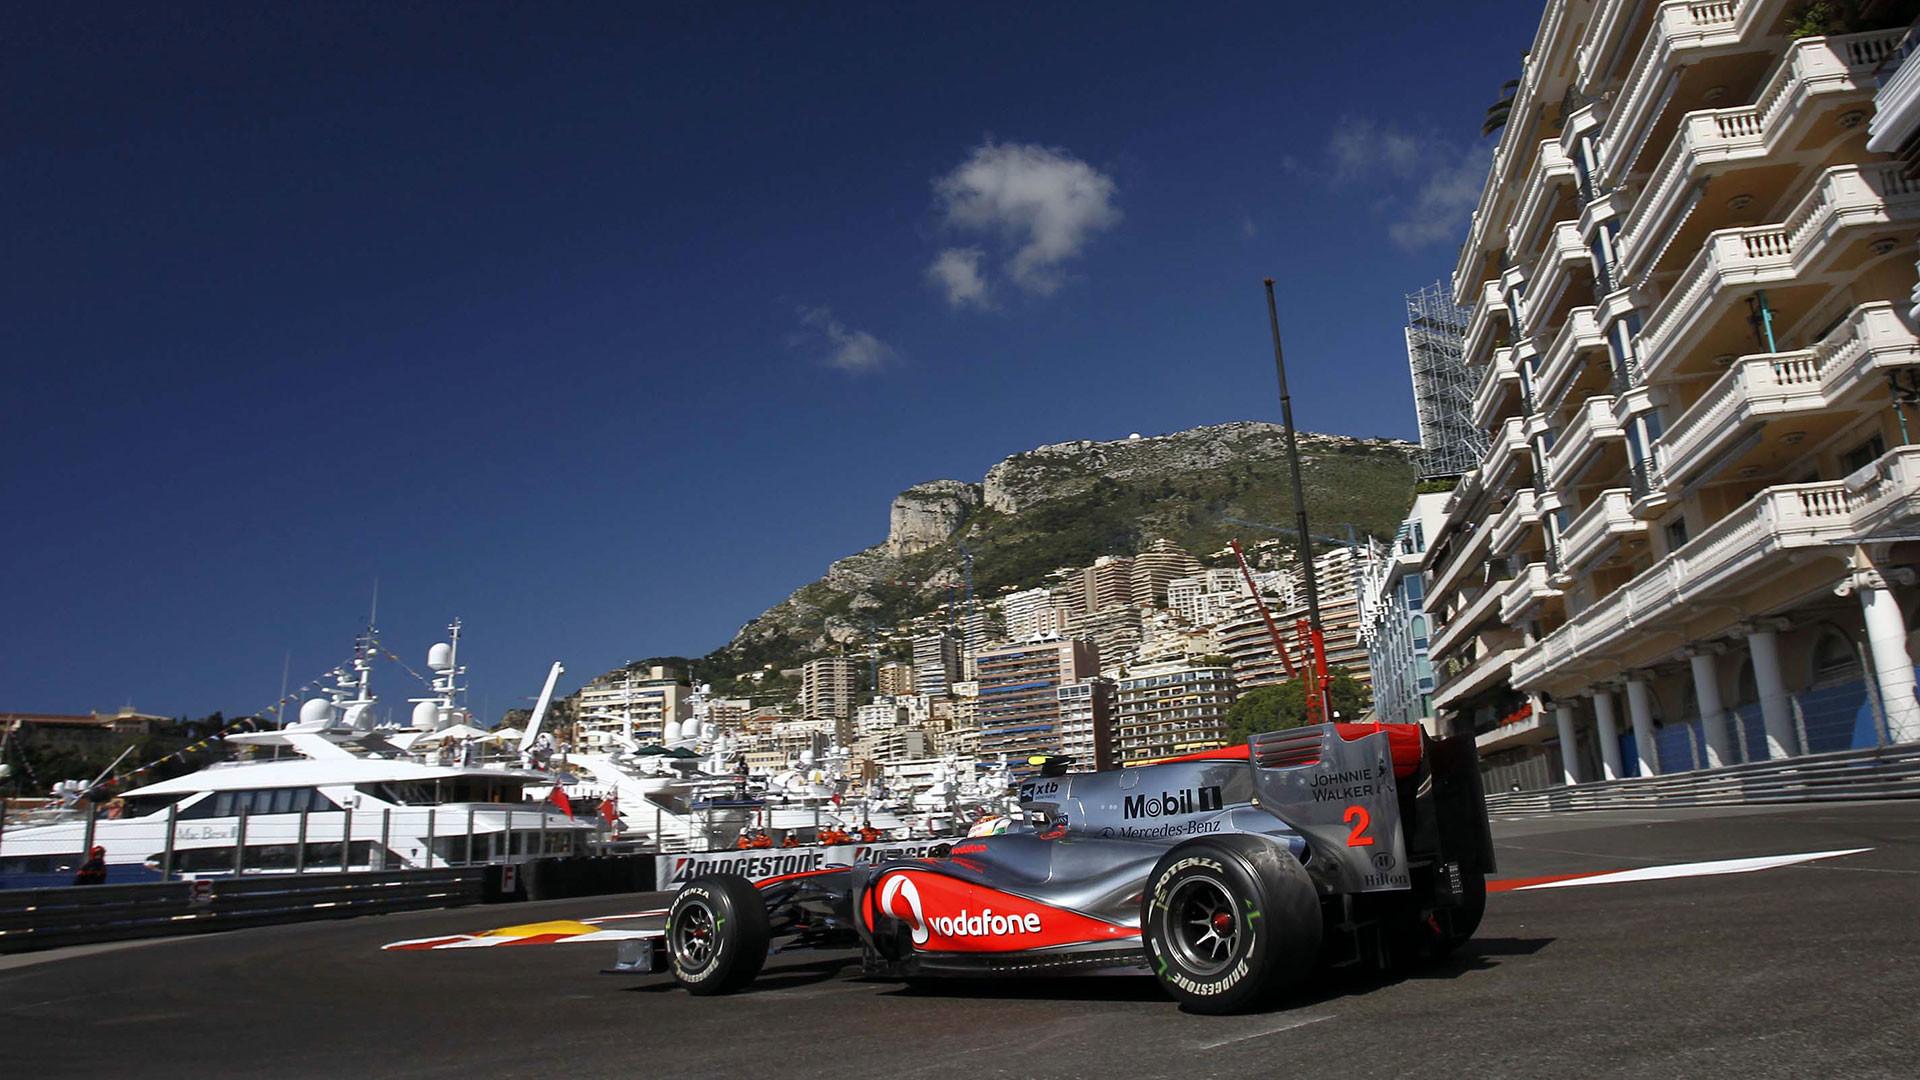 F1-Fansite.com HD Wallpaper 2010 Monaco F1 GP_05.jpg …